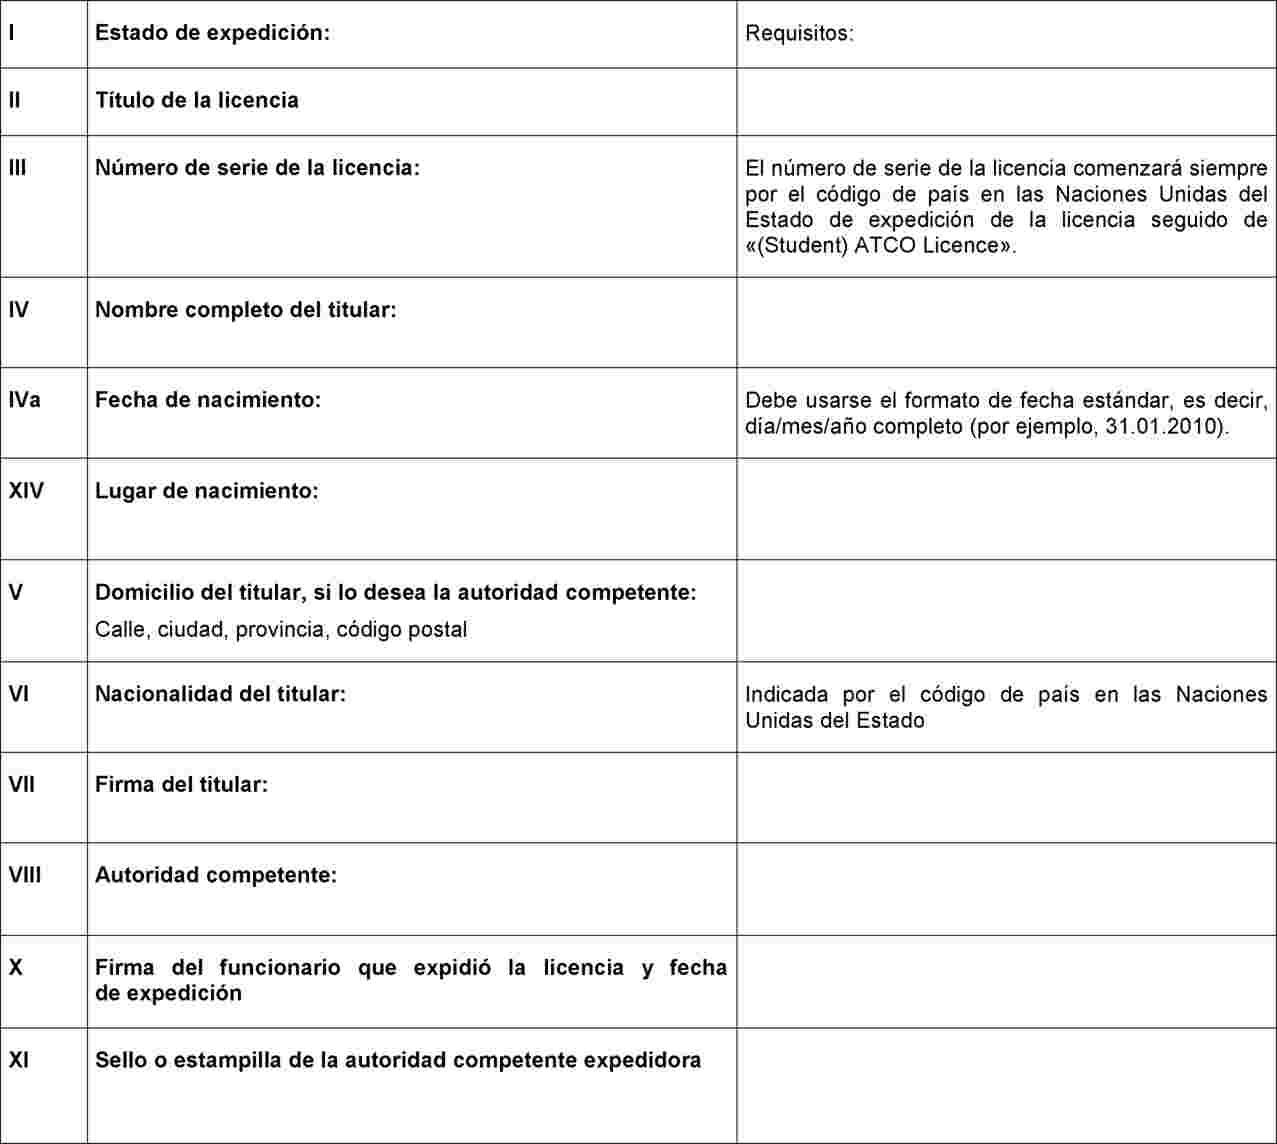 EUR-Lex - 32015R0340 - EN - EUR-Lex